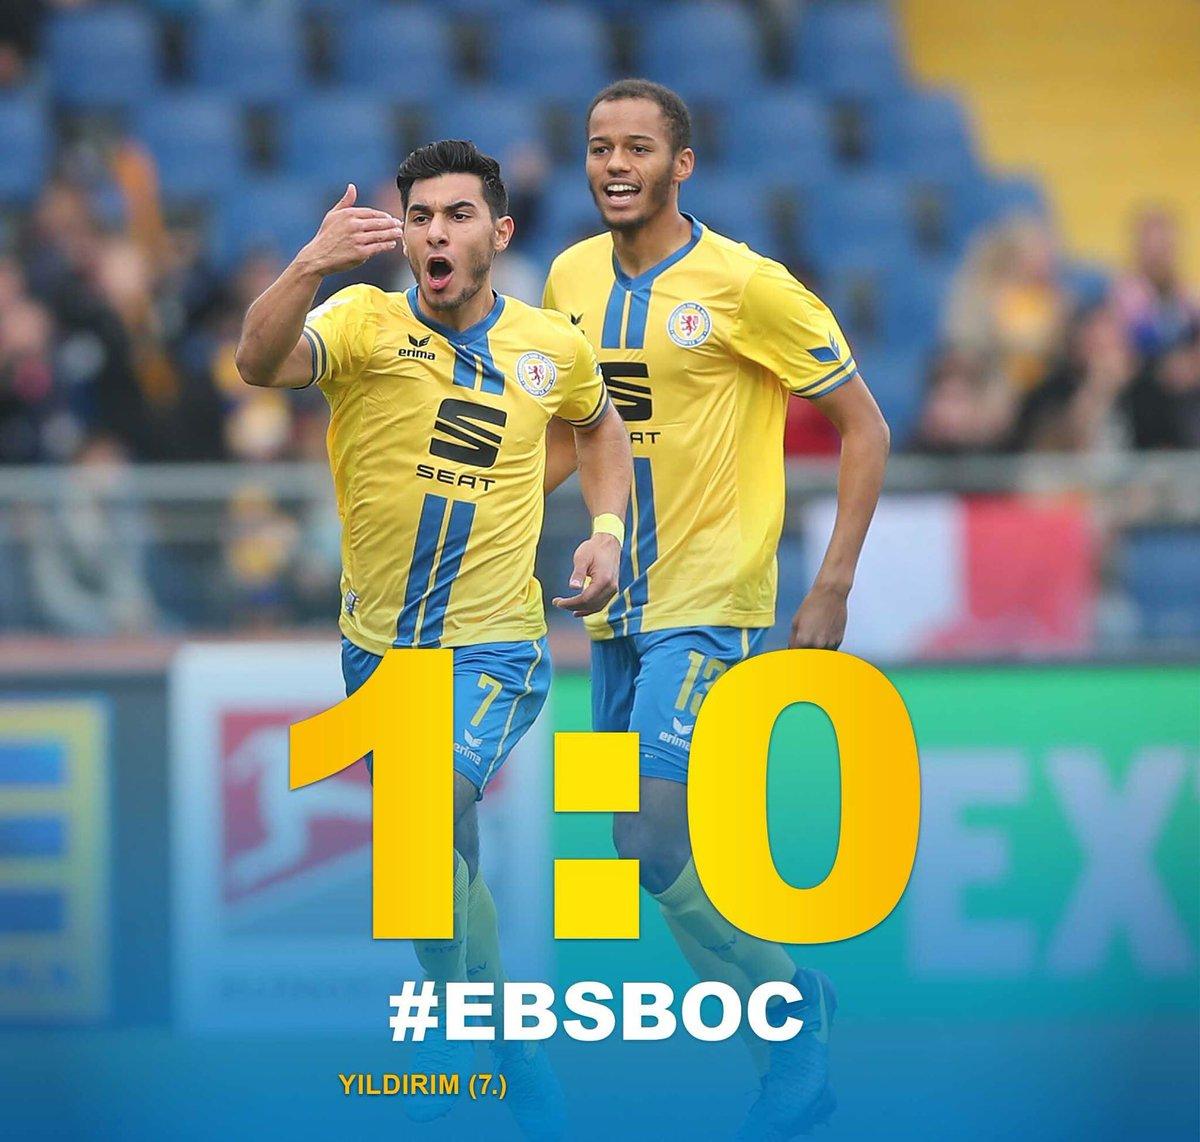 #EBSBOC